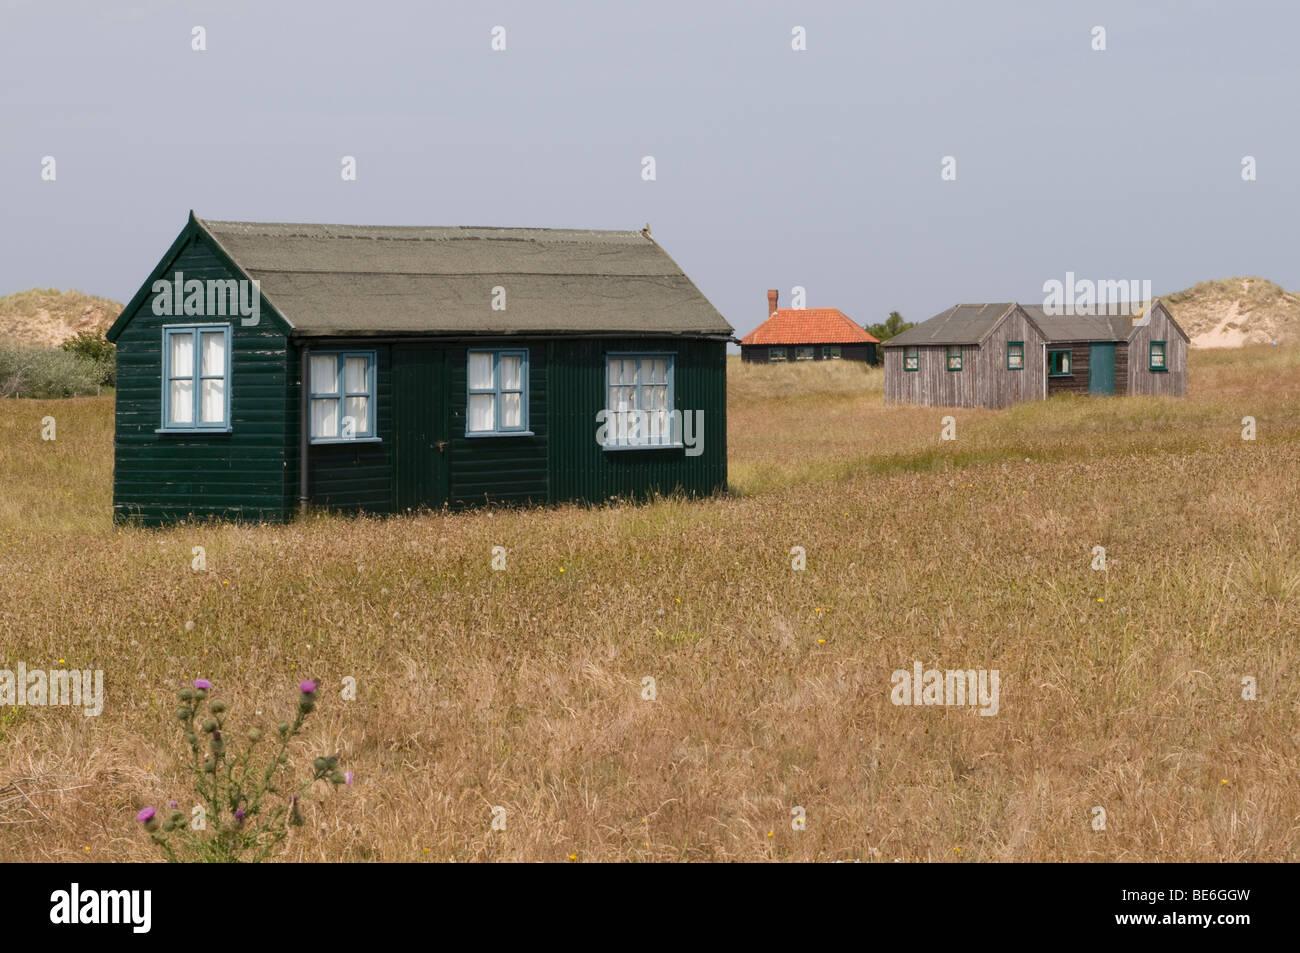 Wooden huts at Blakeney Point, Norfolk. Stock Photo